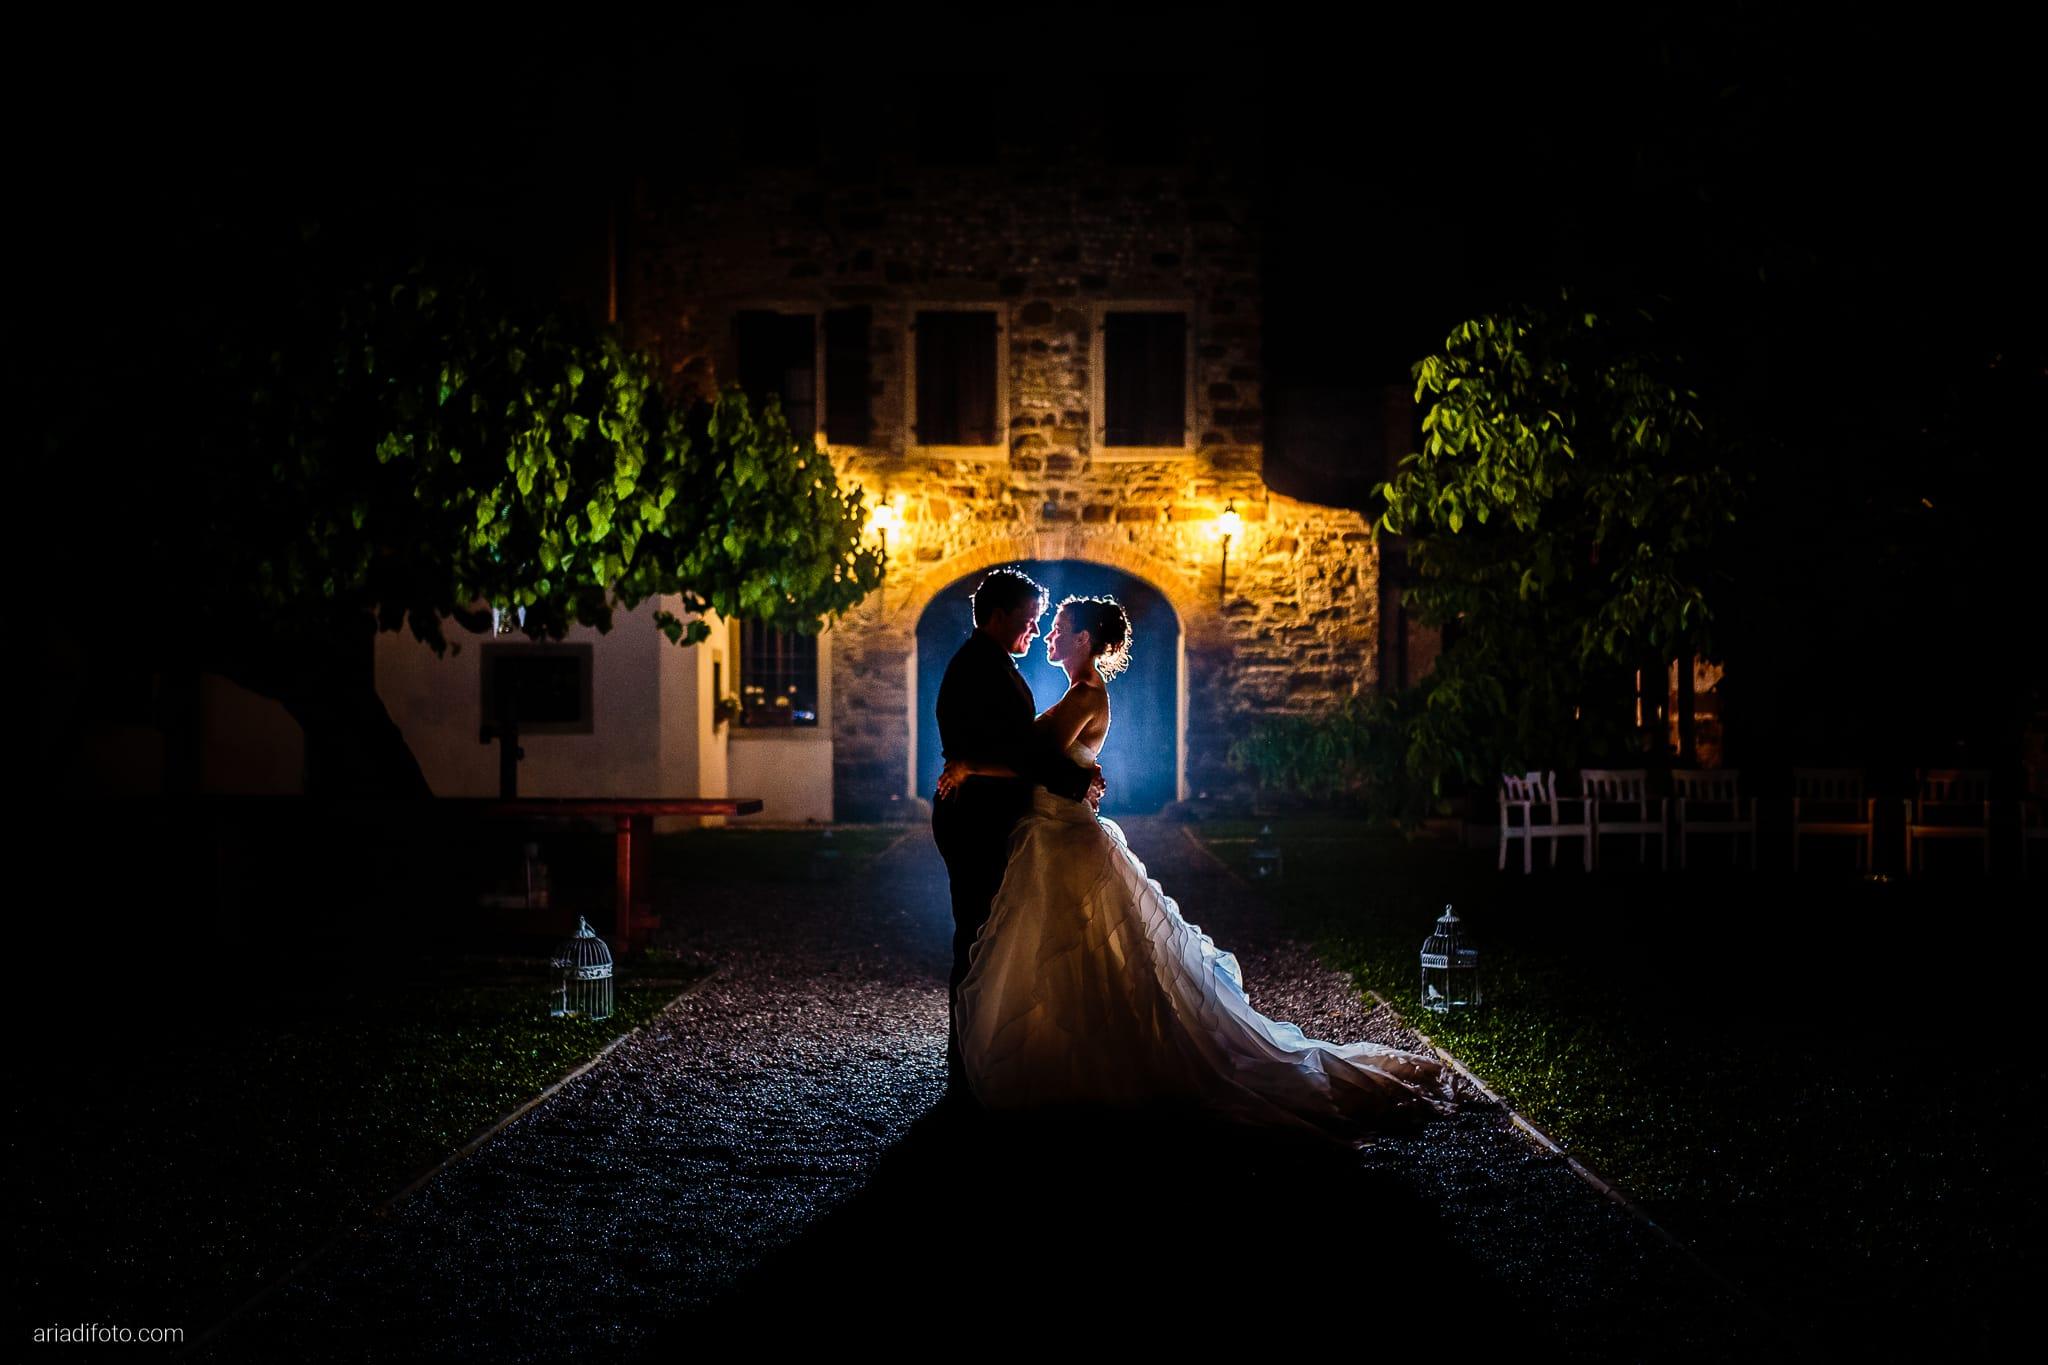 Sarah Matteo Matrimonio Moruzzo Agriturismo Il Vagabondo Buttrio Udine ritratti sposi notte